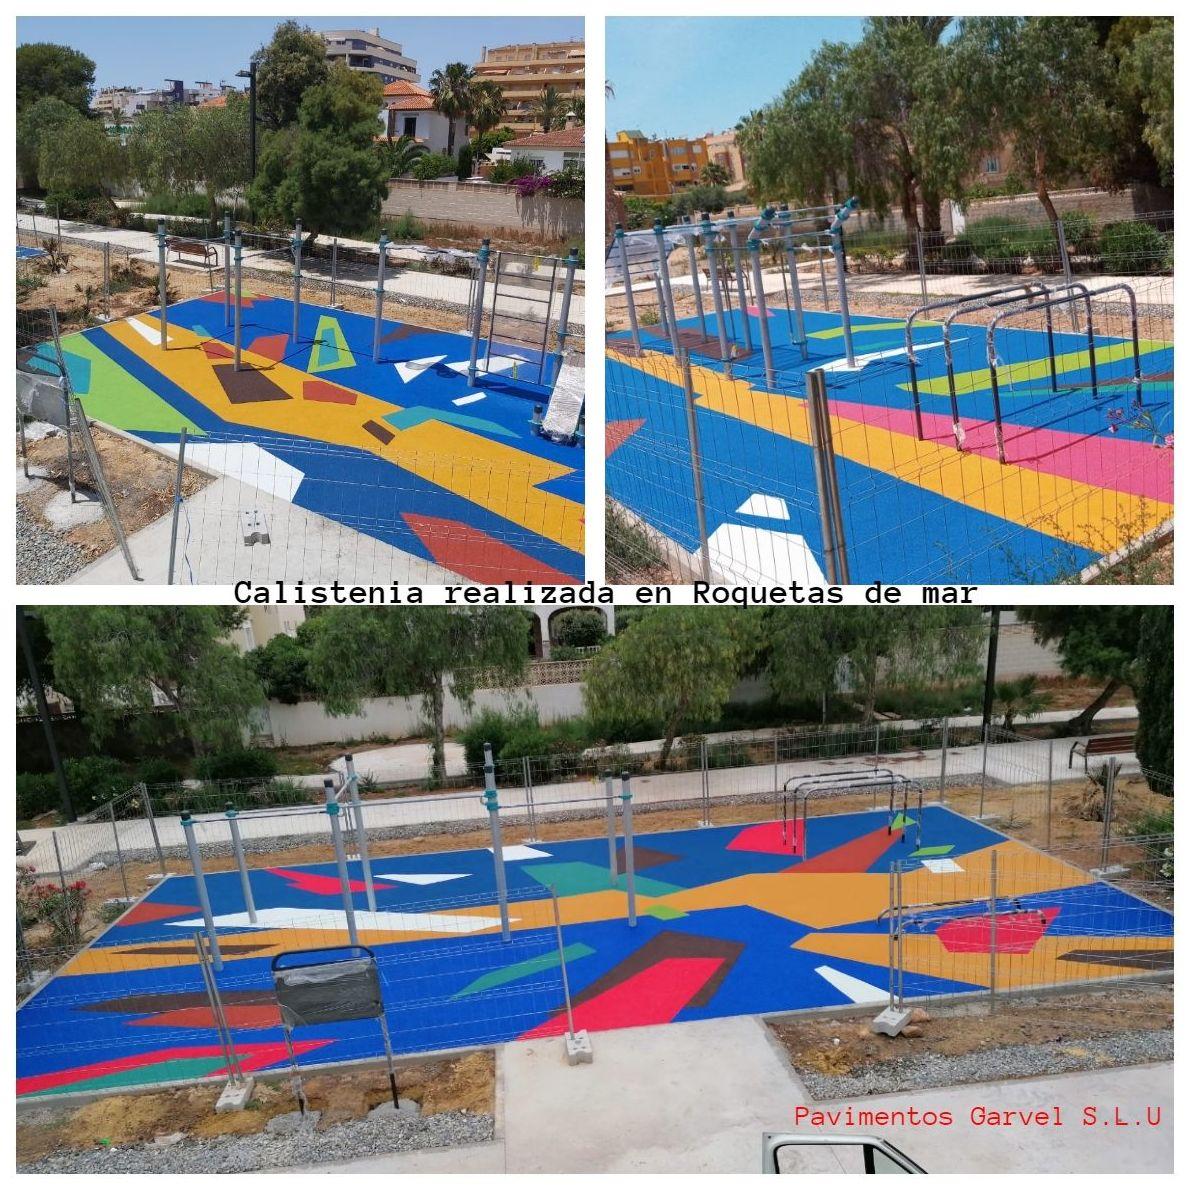 Foto 7 de Instalación de pavimentos de caucho para parques infantiles en Las Cabezas de San Juan | Pavimentos Garvel